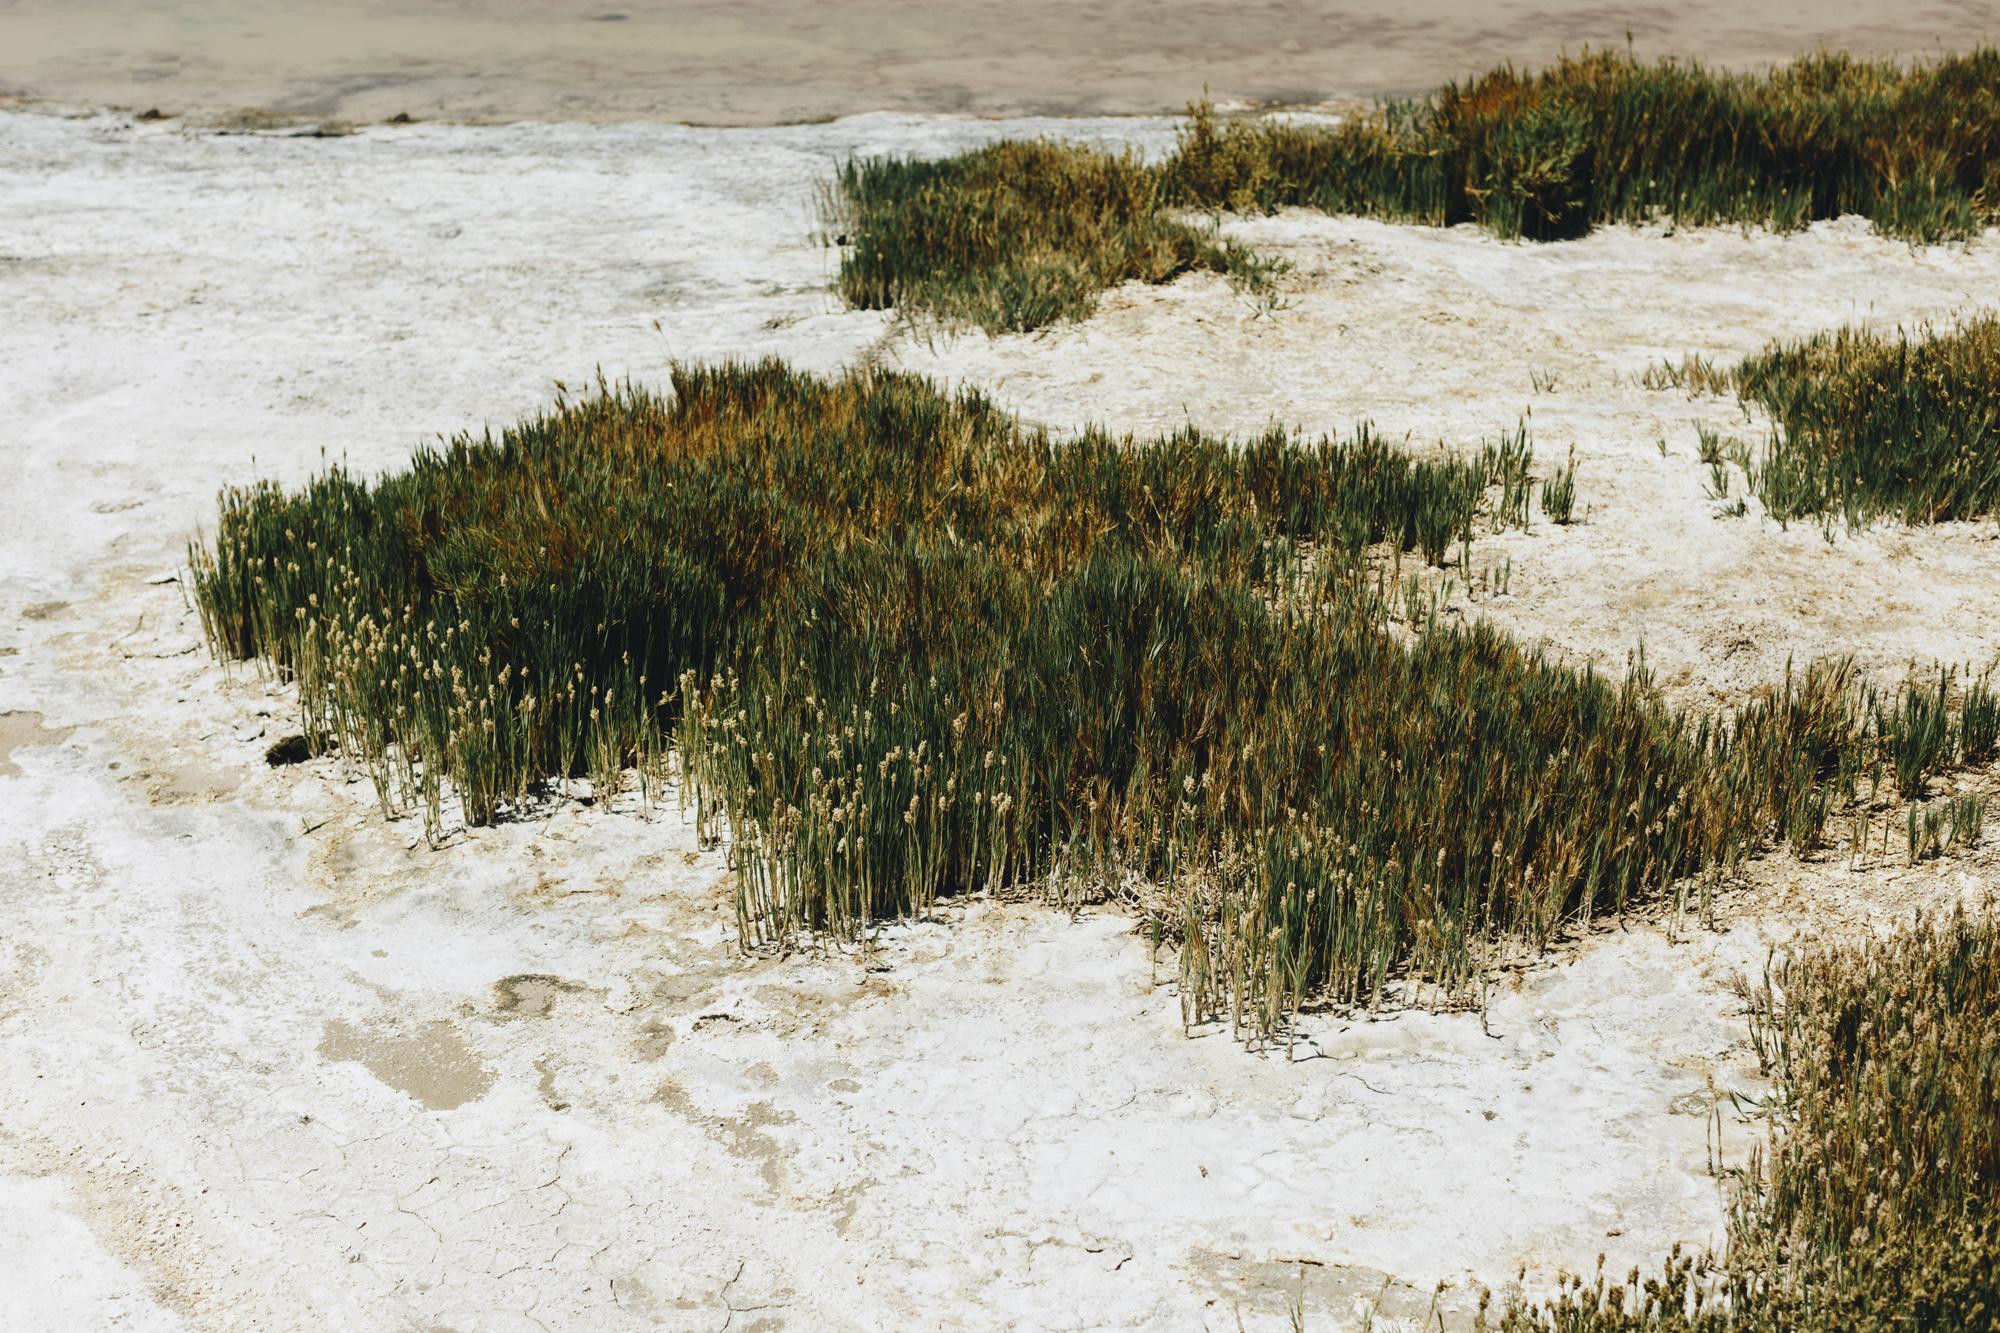 Mael Lambla photographer Chile San pedro atacama desert-49.jpg